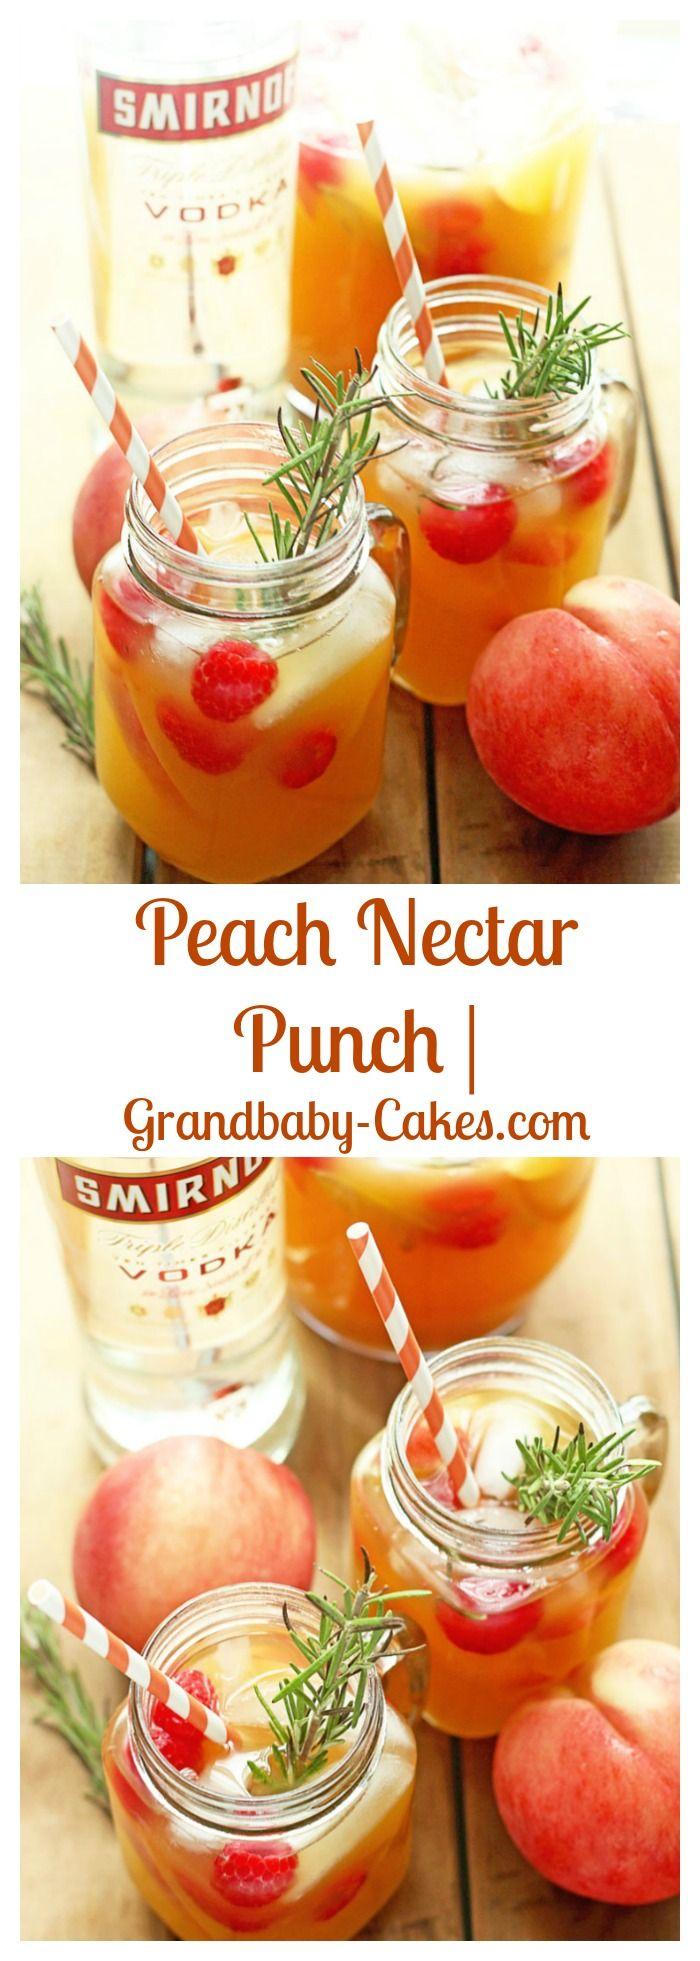 Peach Nectar Punch | Grandbaby-Cakes.com